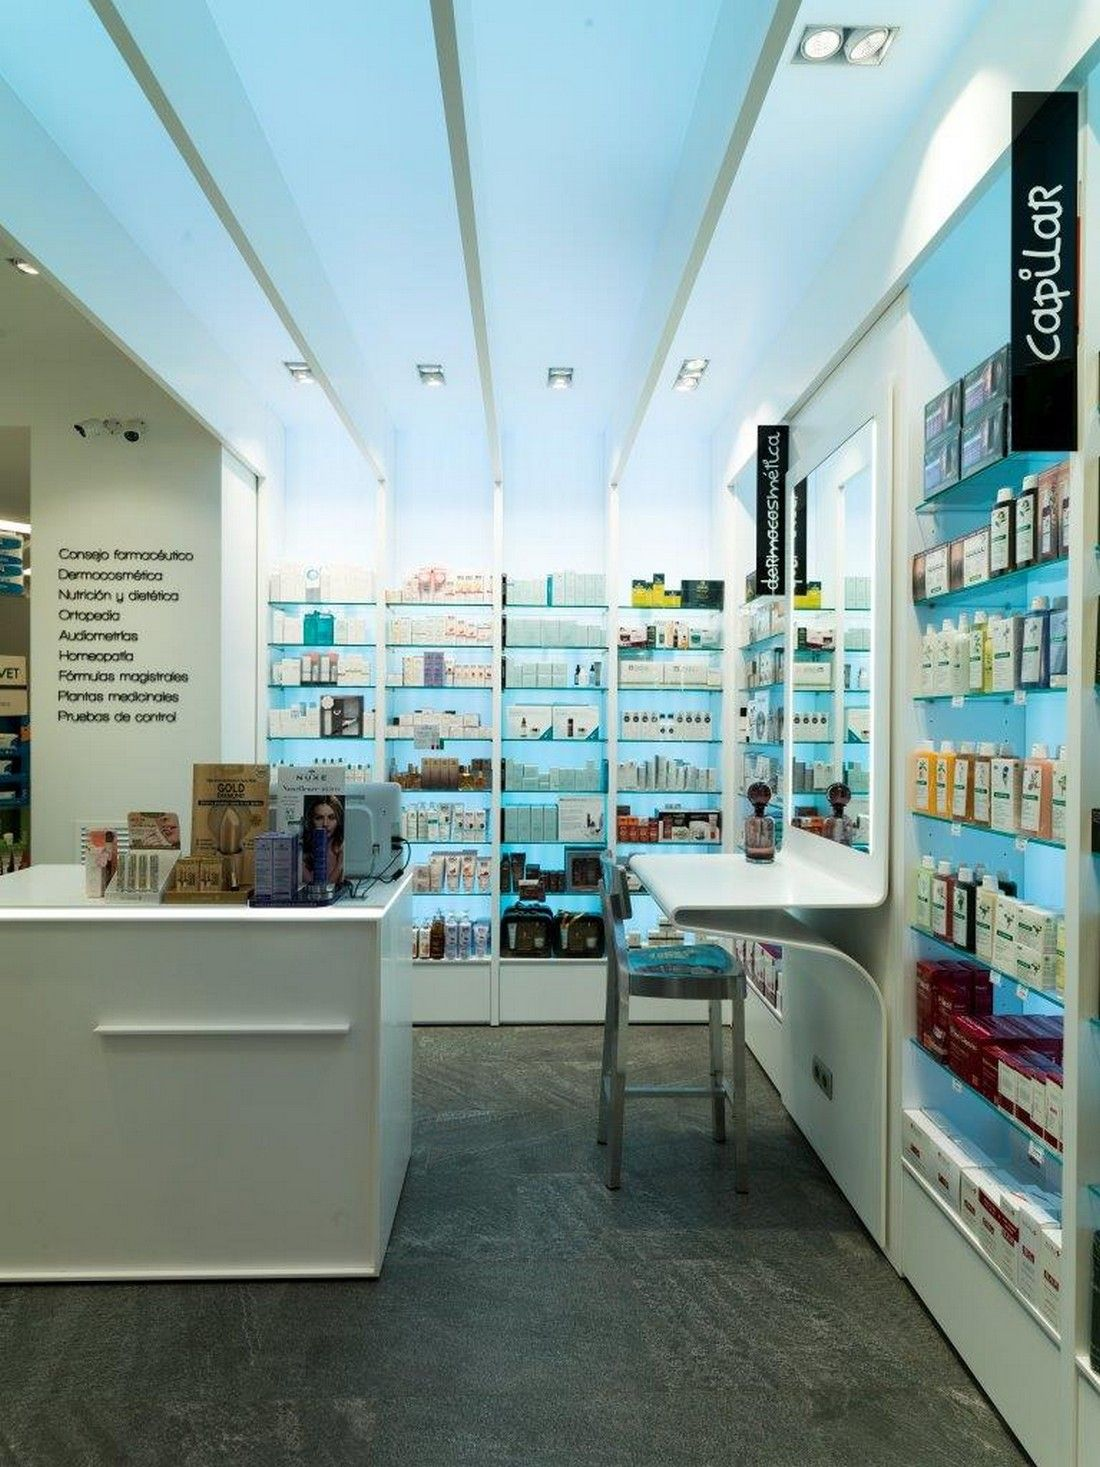 Organiser pharmacie